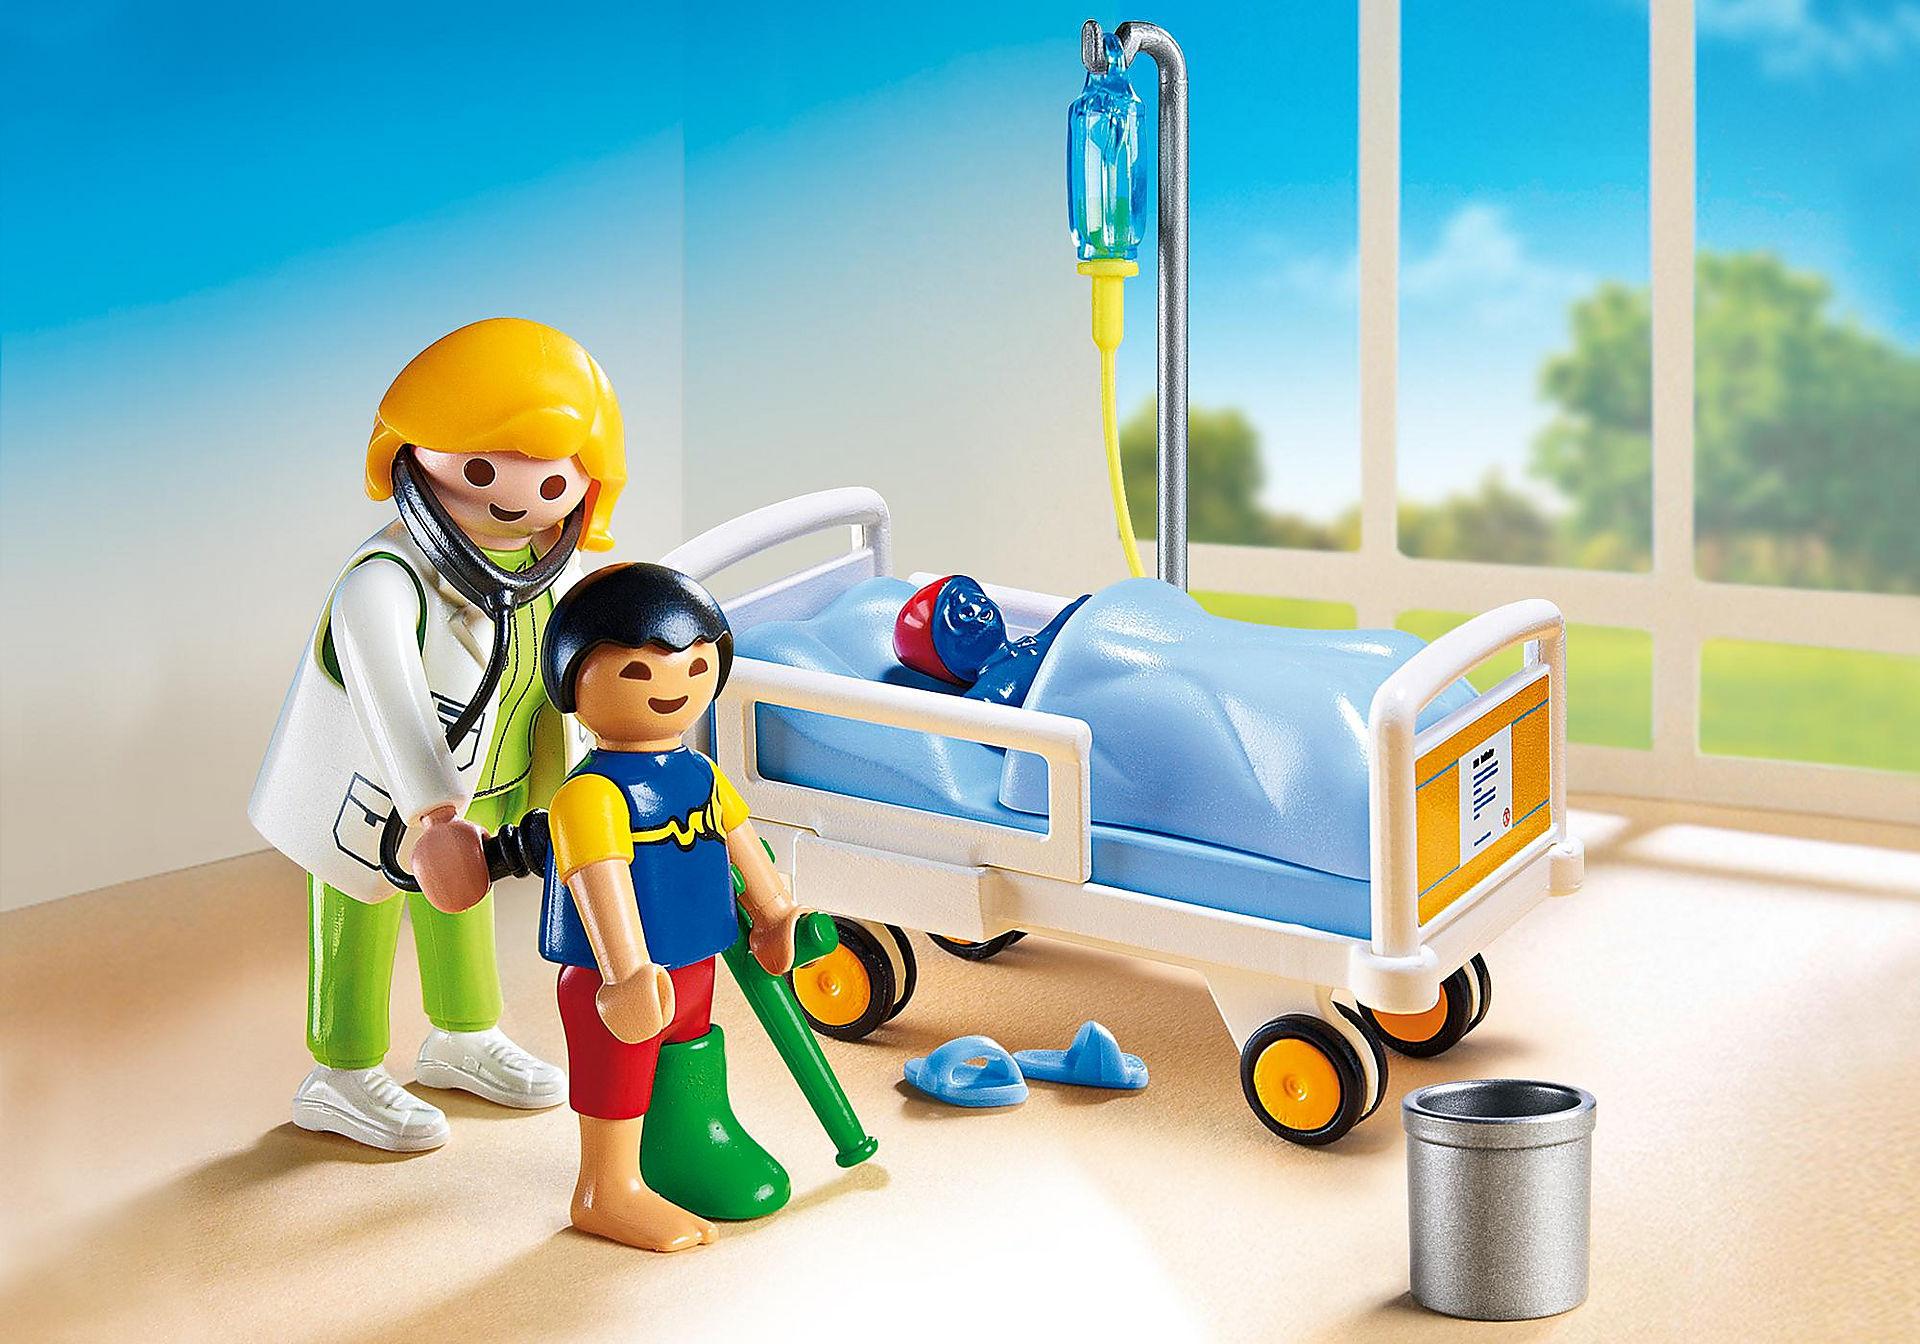 http://media.playmobil.com/i/playmobil/6661_product_detail/Doctora con niño